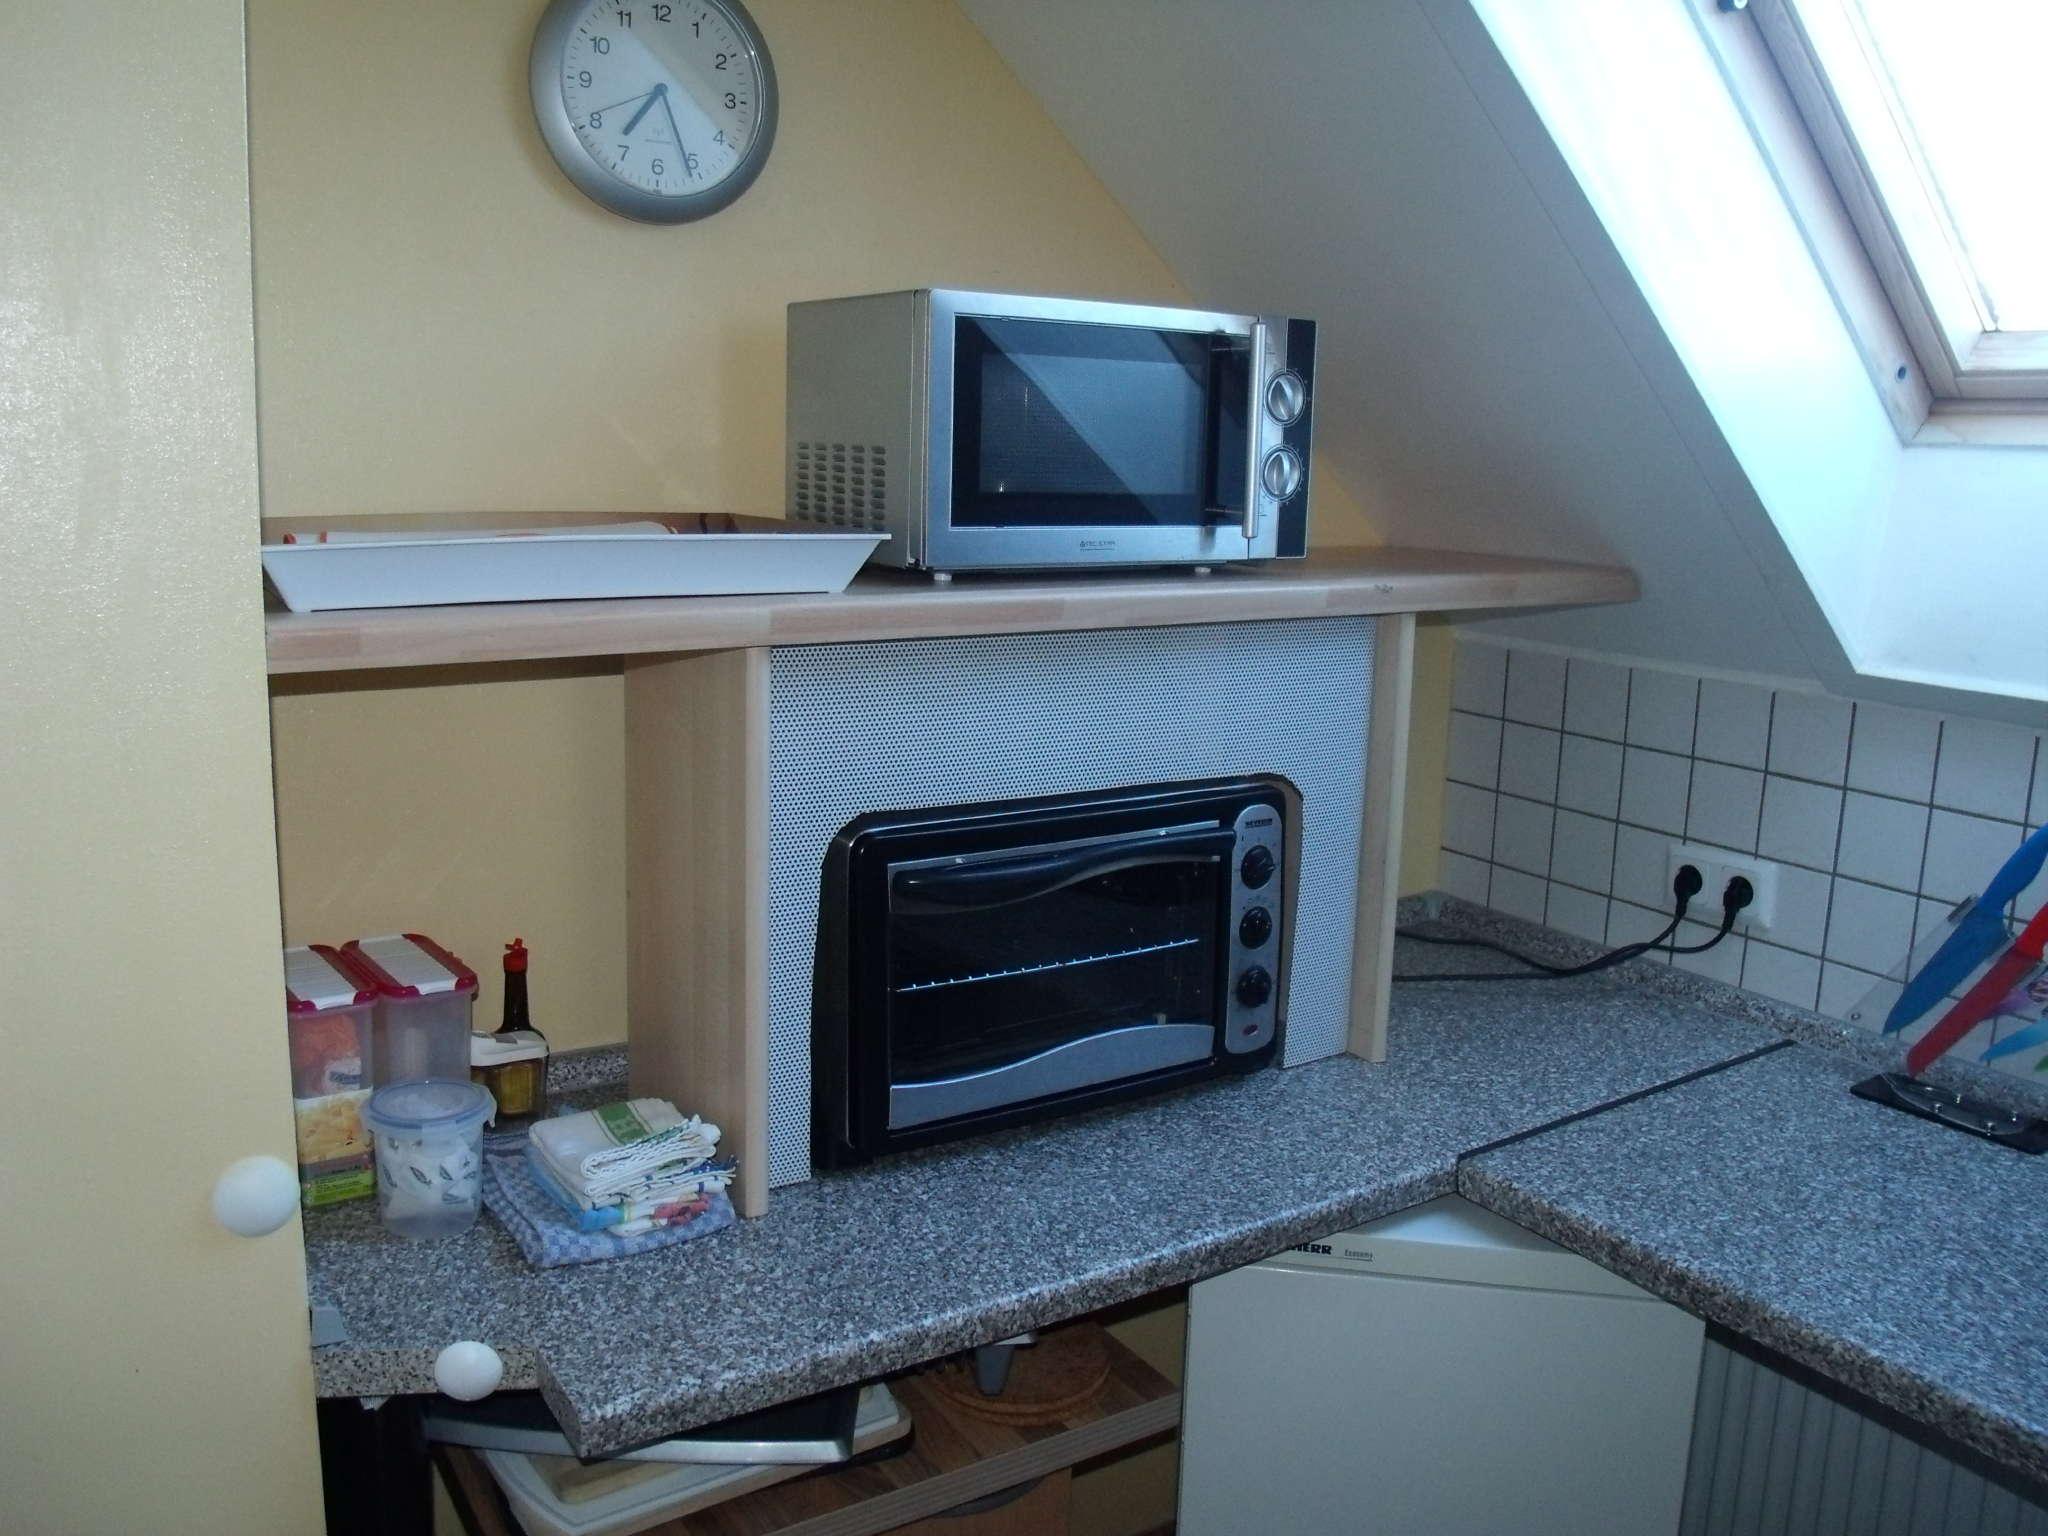 Küche links 2. Kühlschrank Backofen usw.